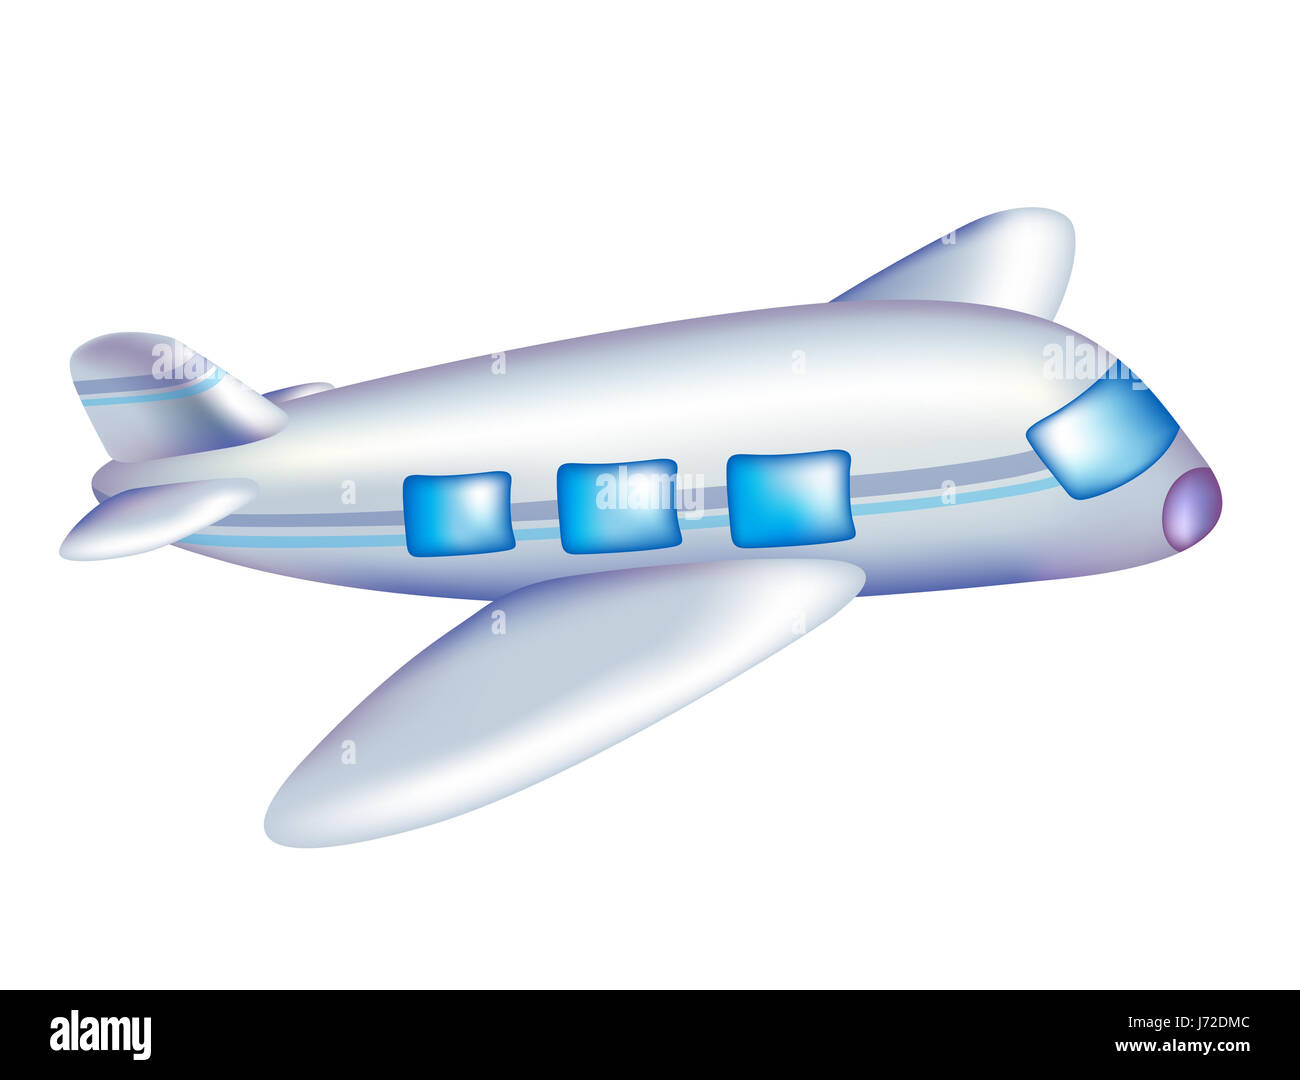 Toy Cartoon Aircraft Aeroplane Plane Airplane Blue Travel Flight Traffic